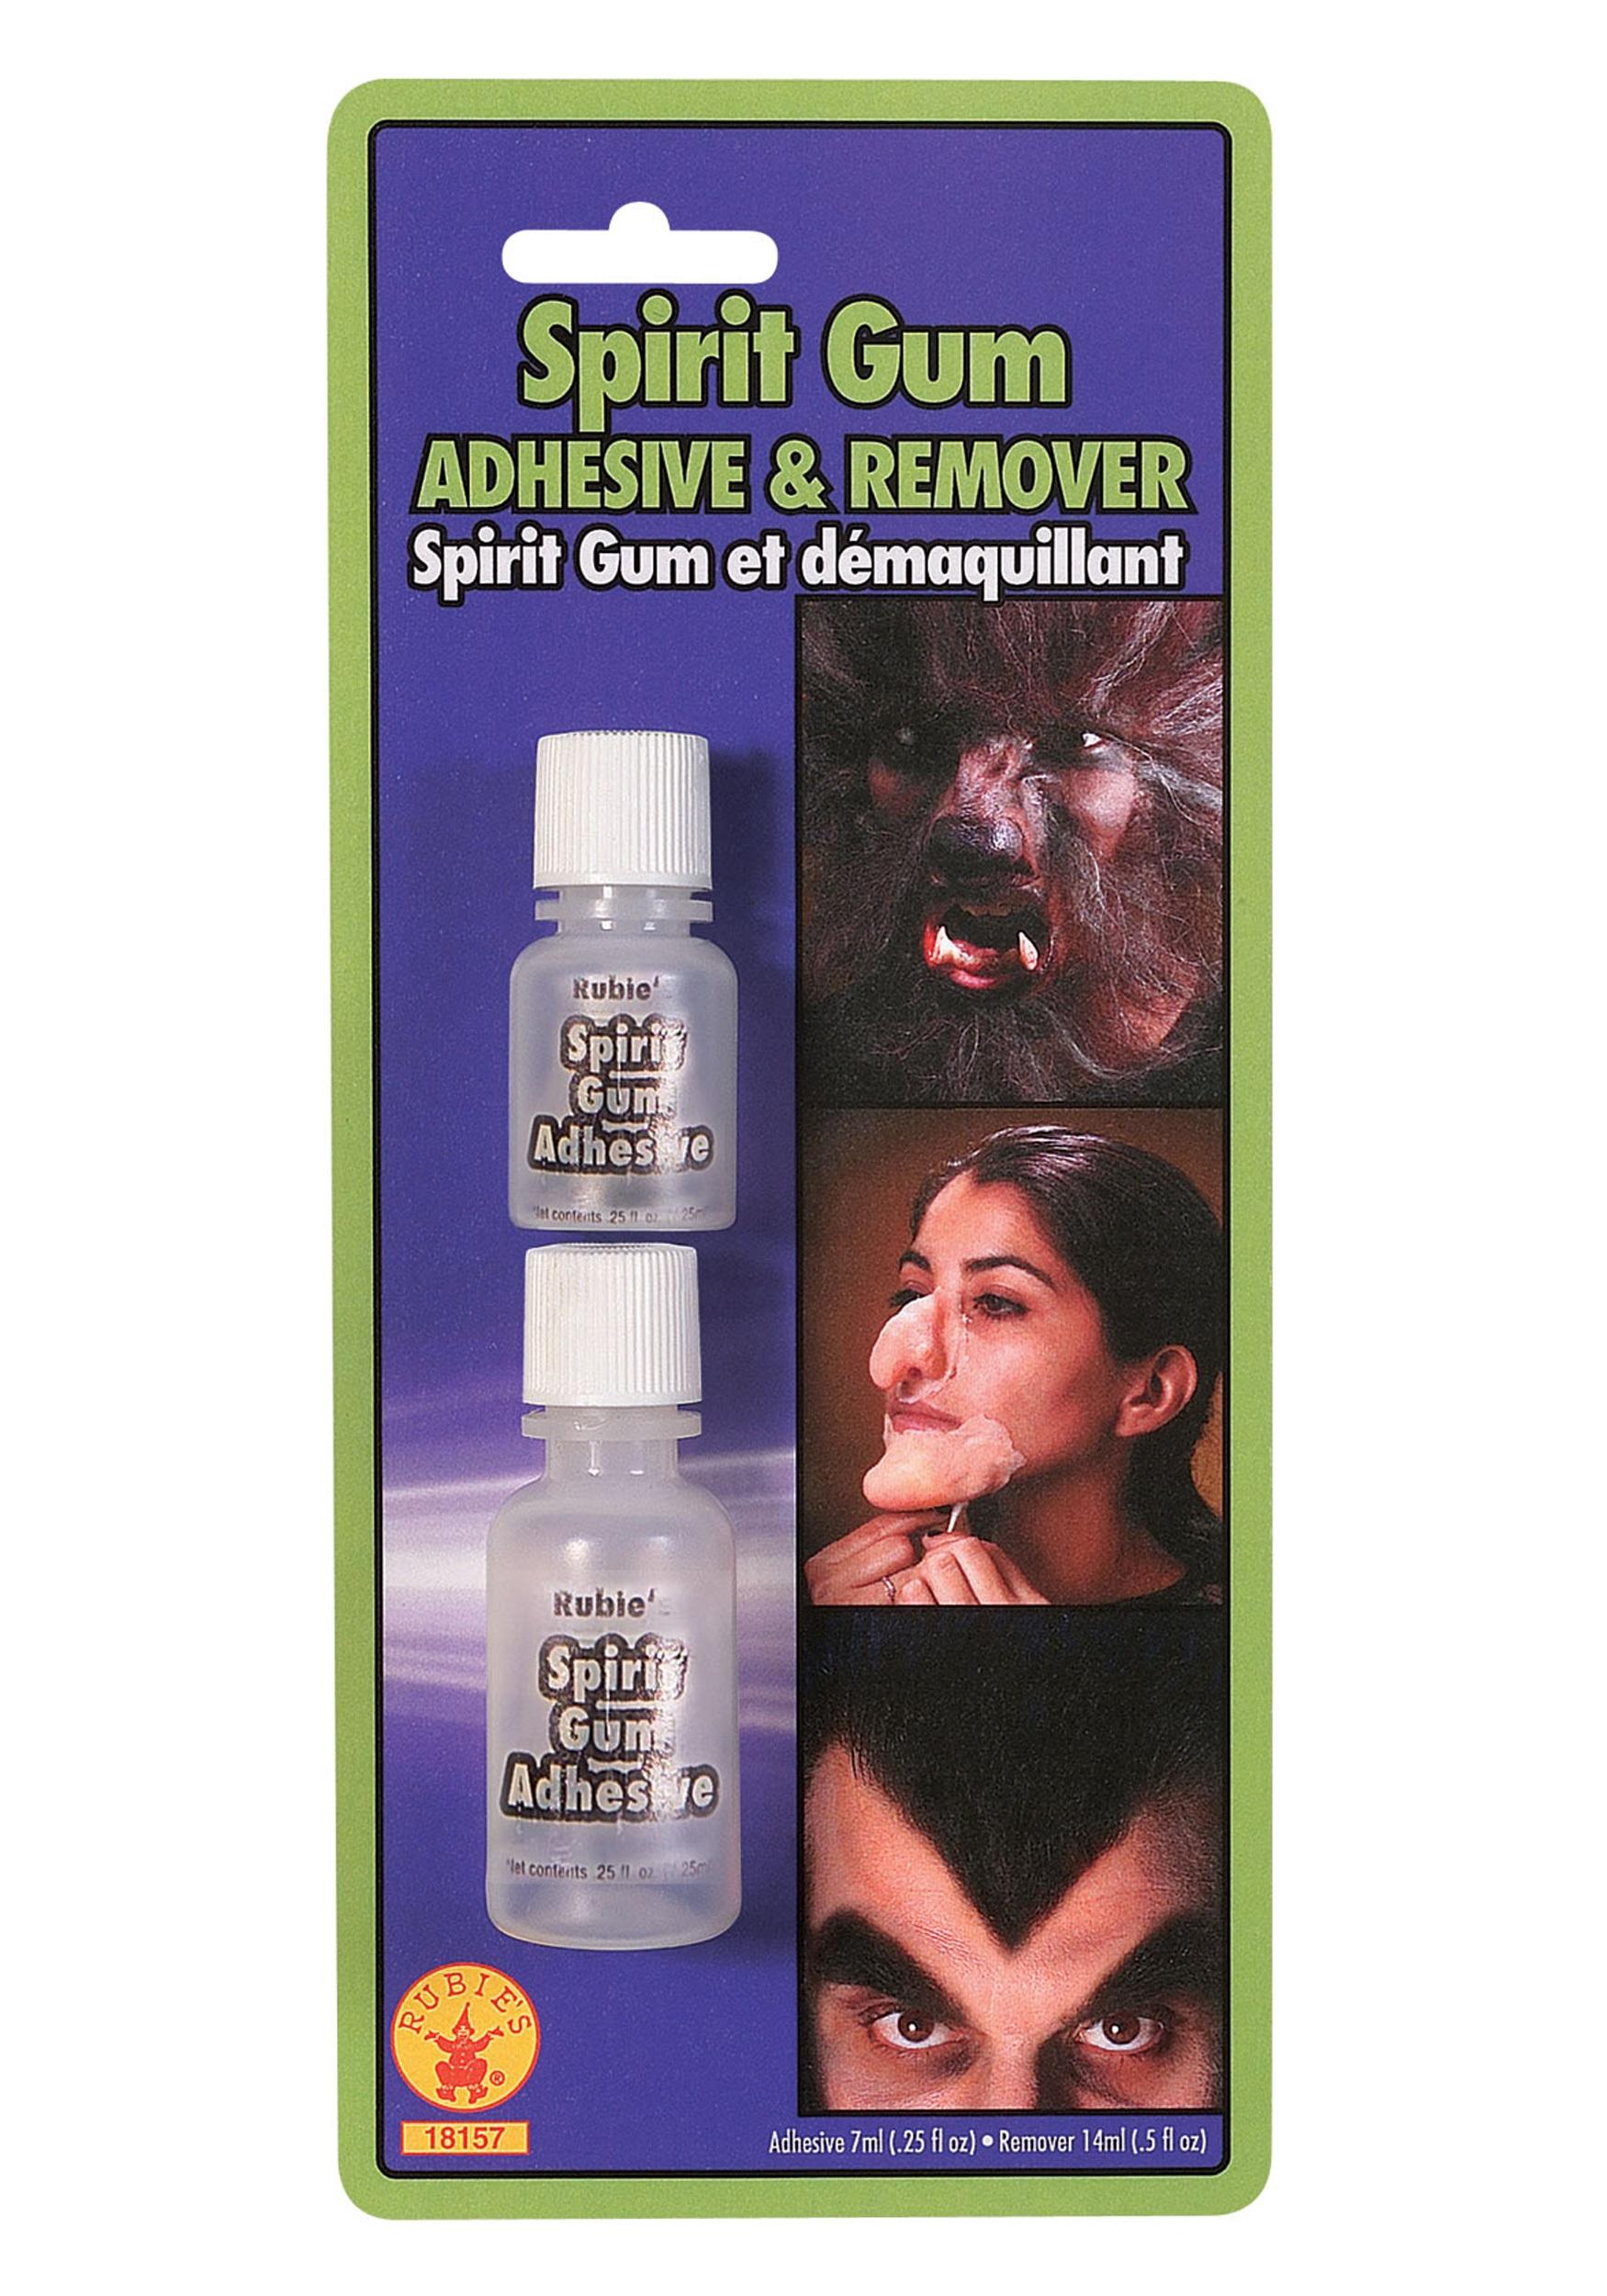 Spirit Gum Adhesive with Remover